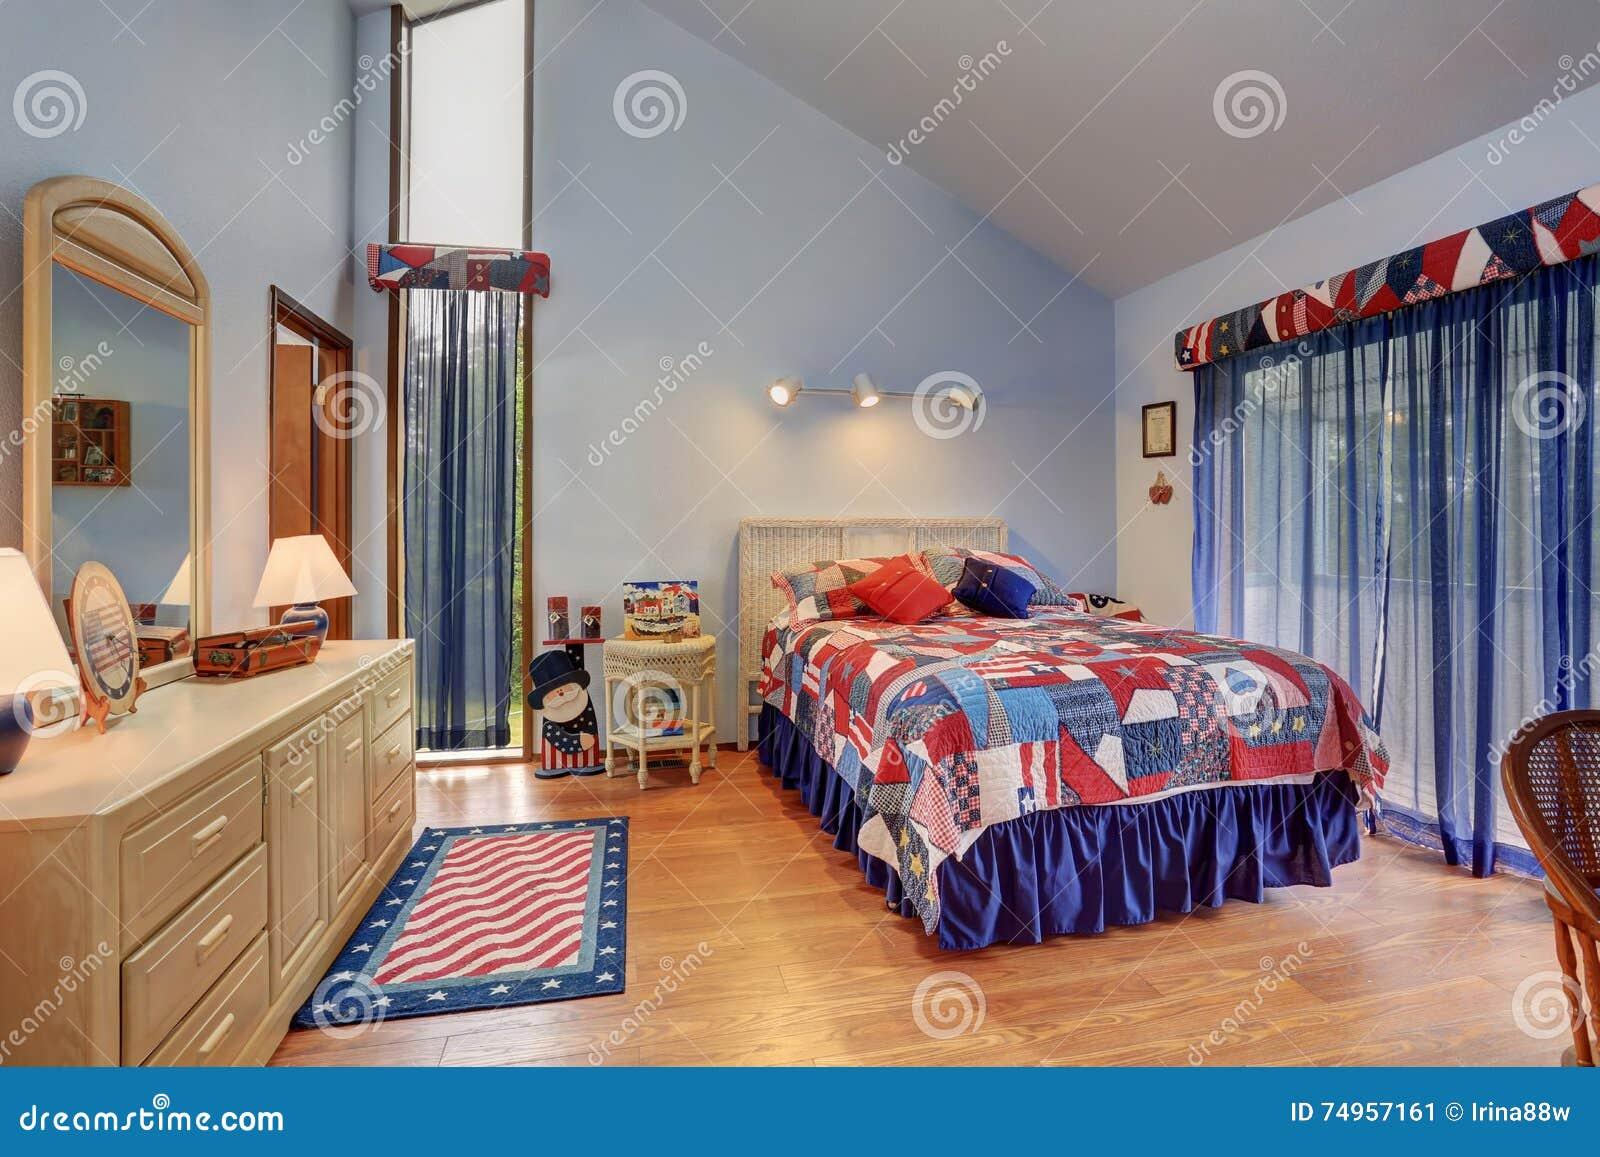 Slaapkamer Amerikaanse Stijl : Rood en blauw binnenland van gewelfde plafondslaapkamer in